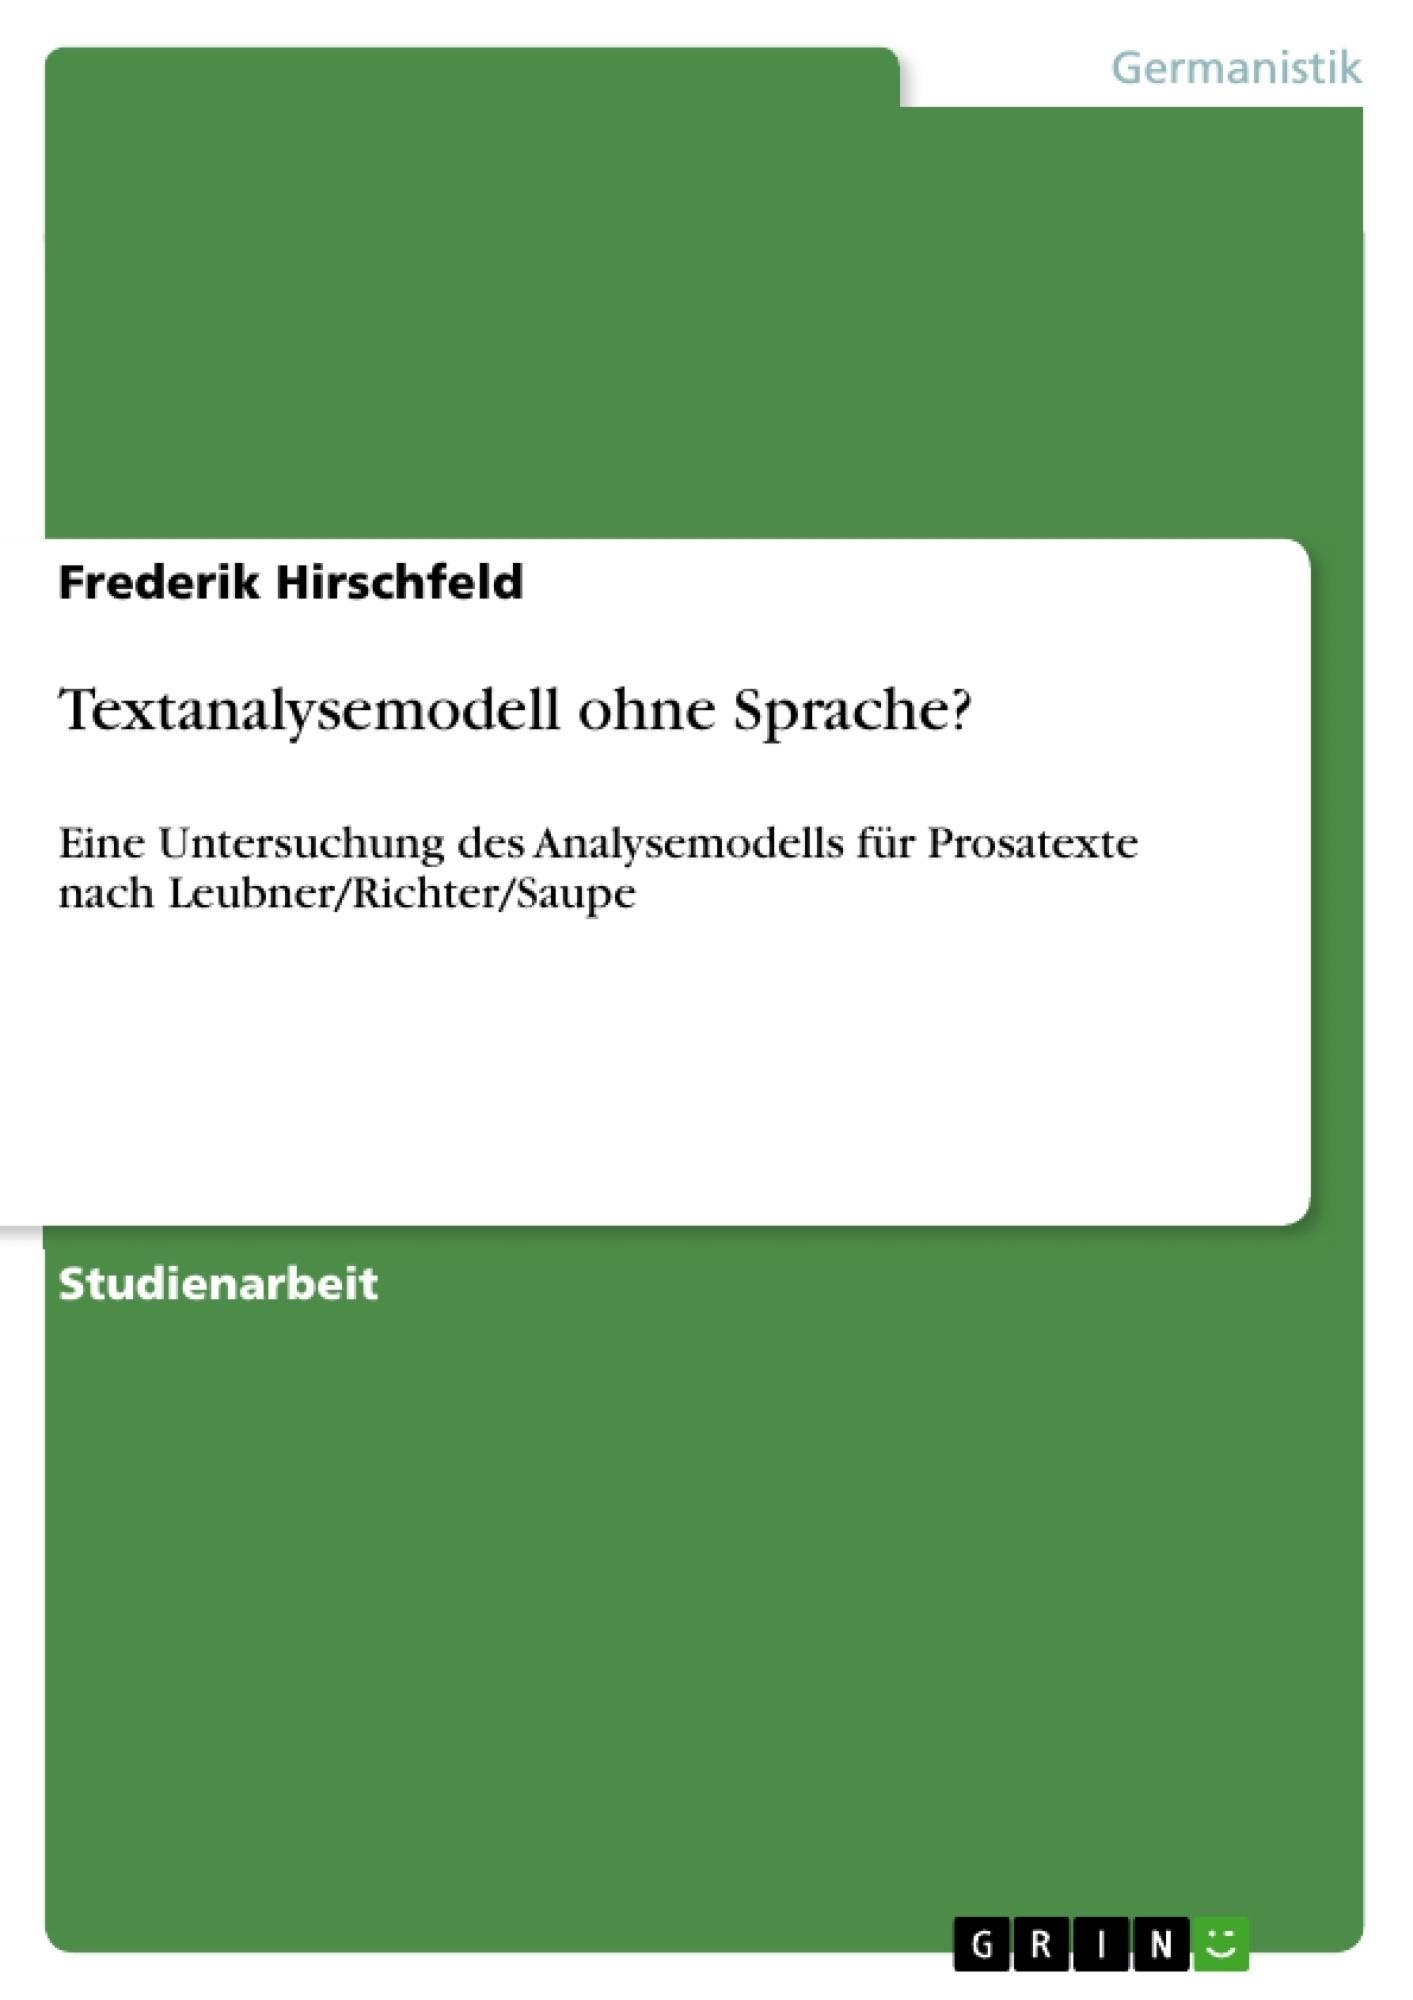 Titel: Textanalysemodell ohne Sprache?